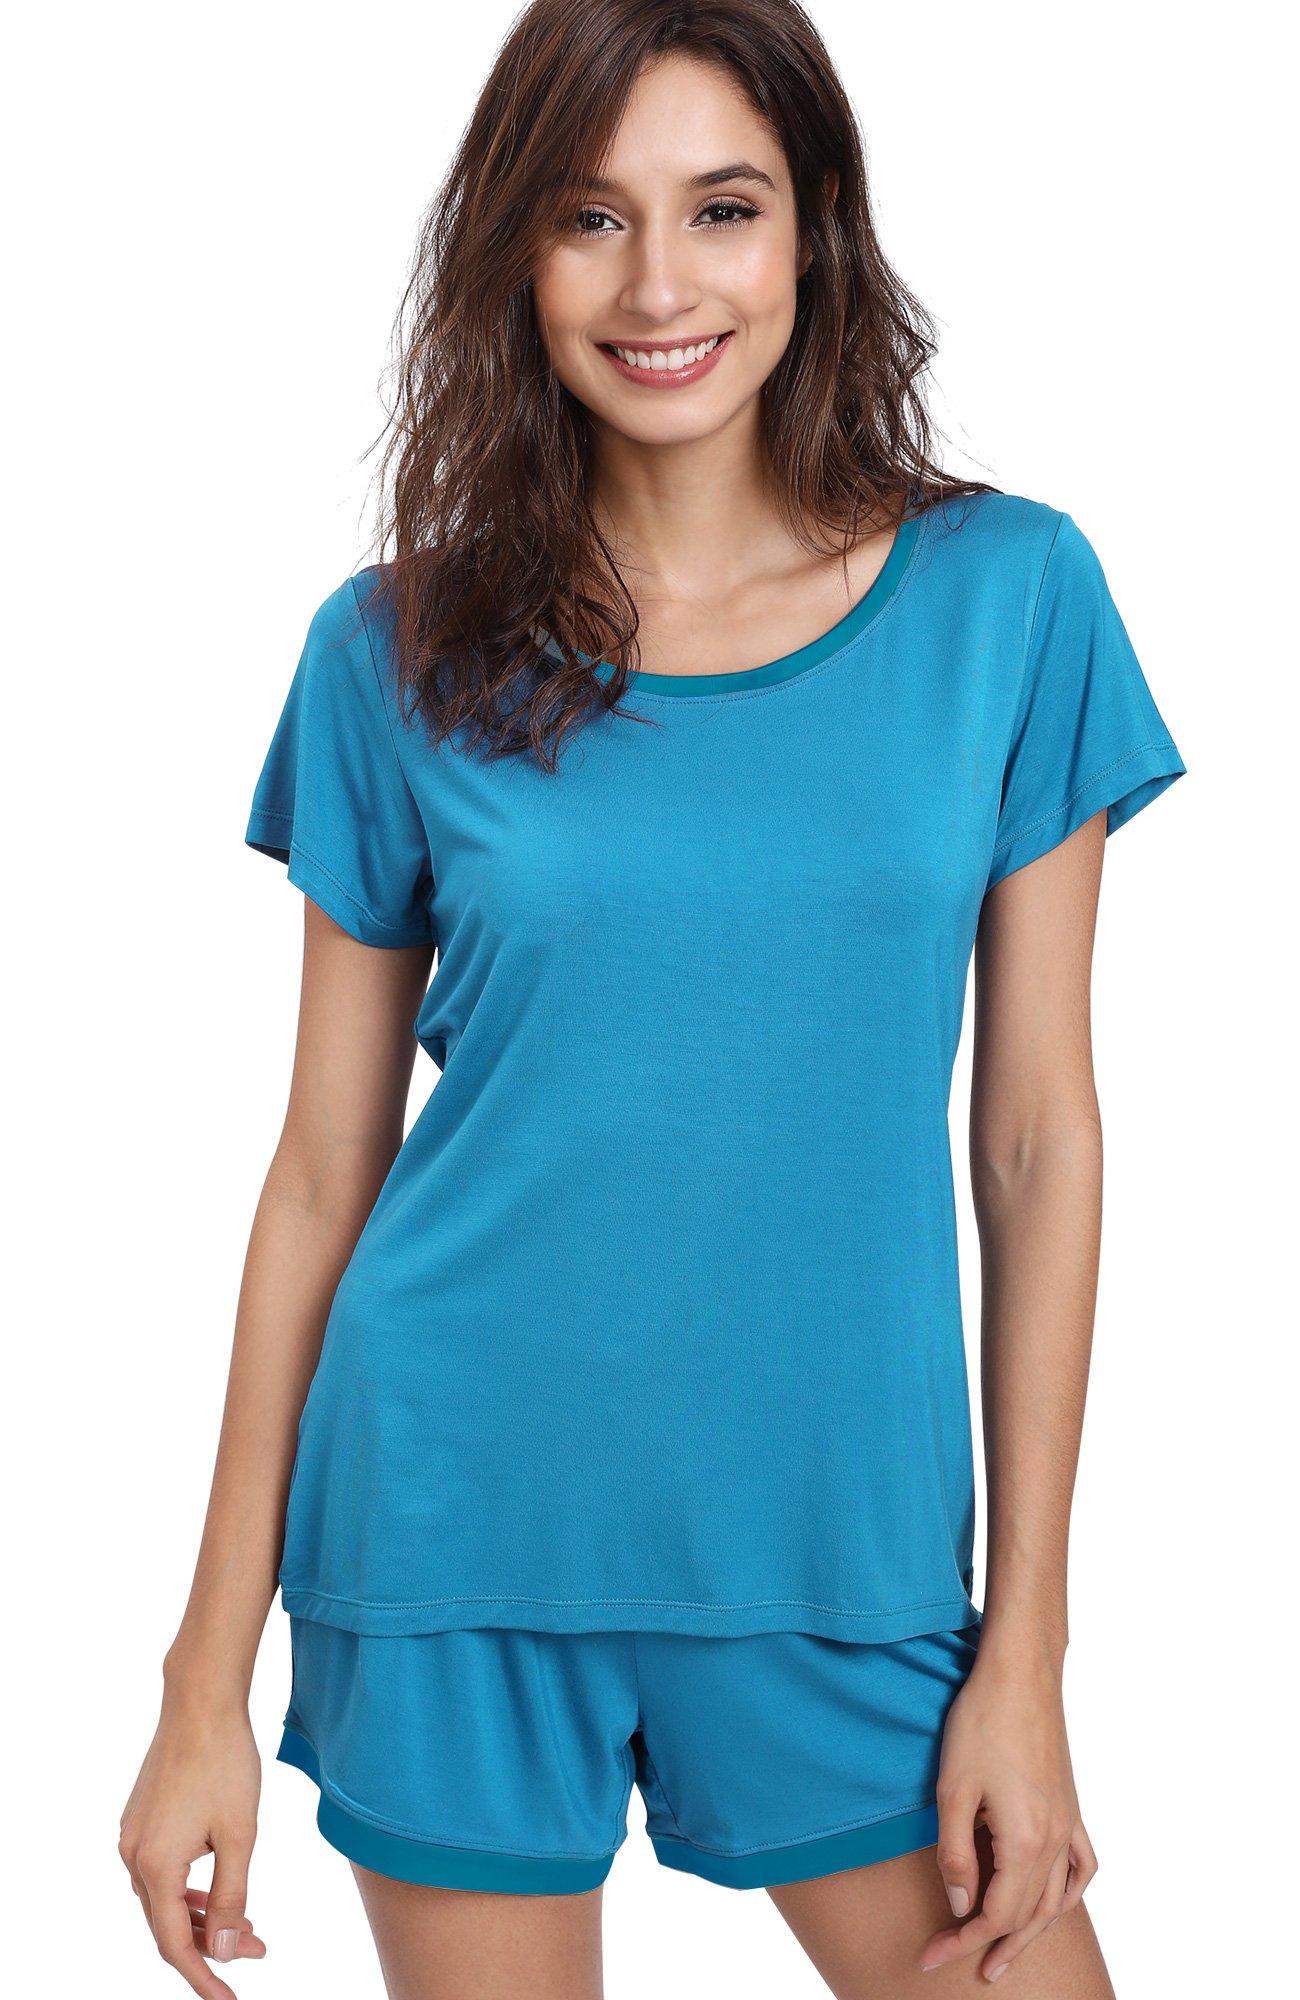 GYS Women's Soft Scoop Neck Shorts Pajama Set (M,Capri Blue)